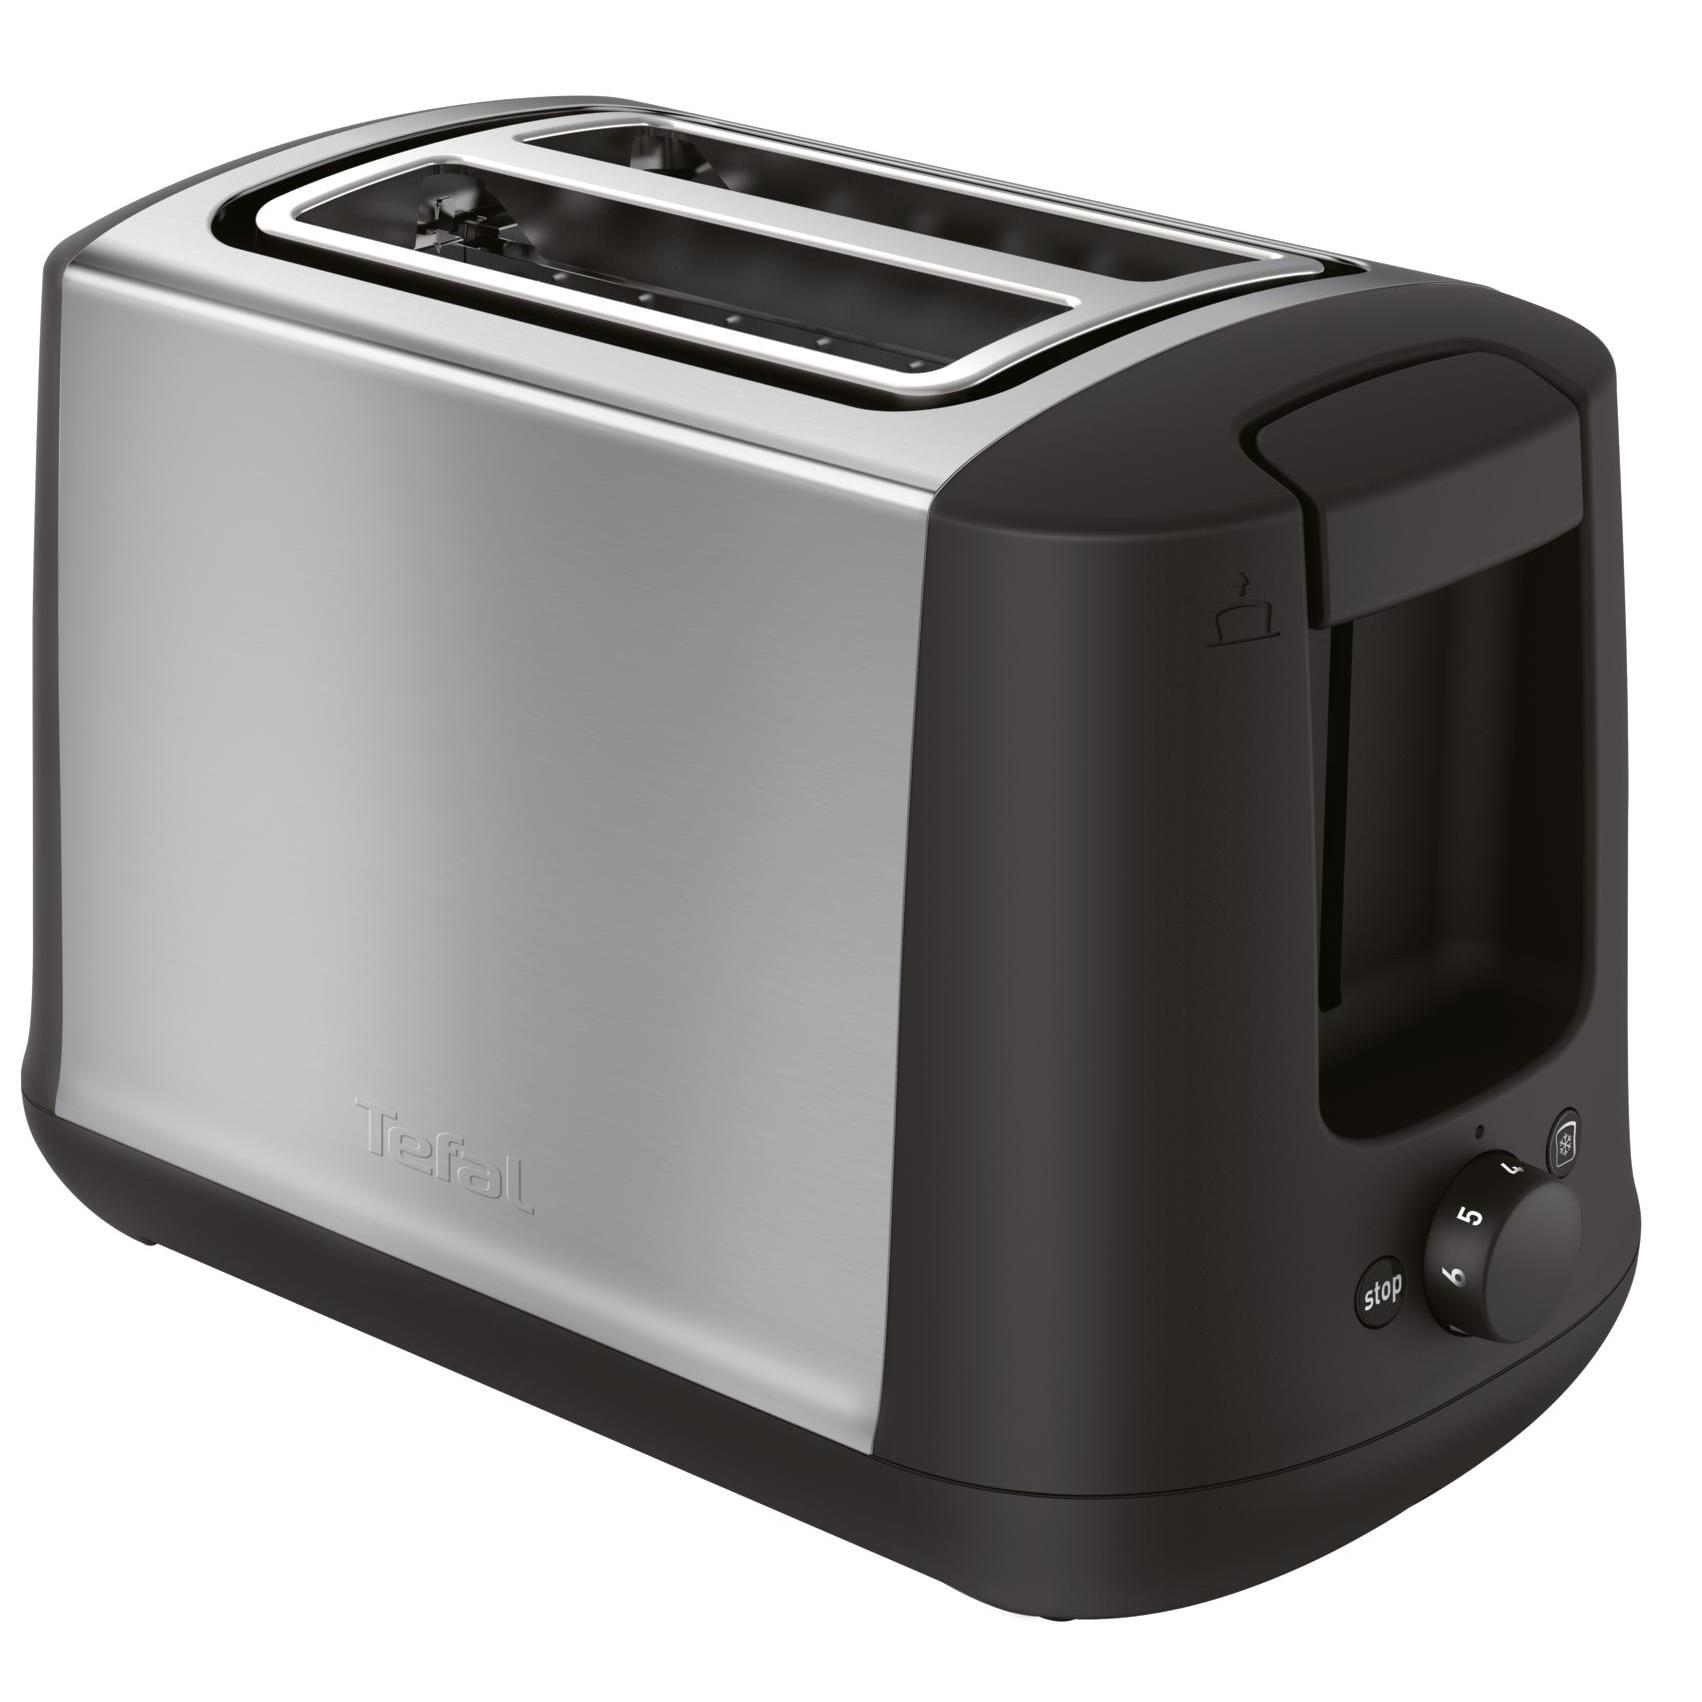 Fotografie Toaster Tefal Confidence TT340830, 850W, 7 niveluri de rumenire, Inox